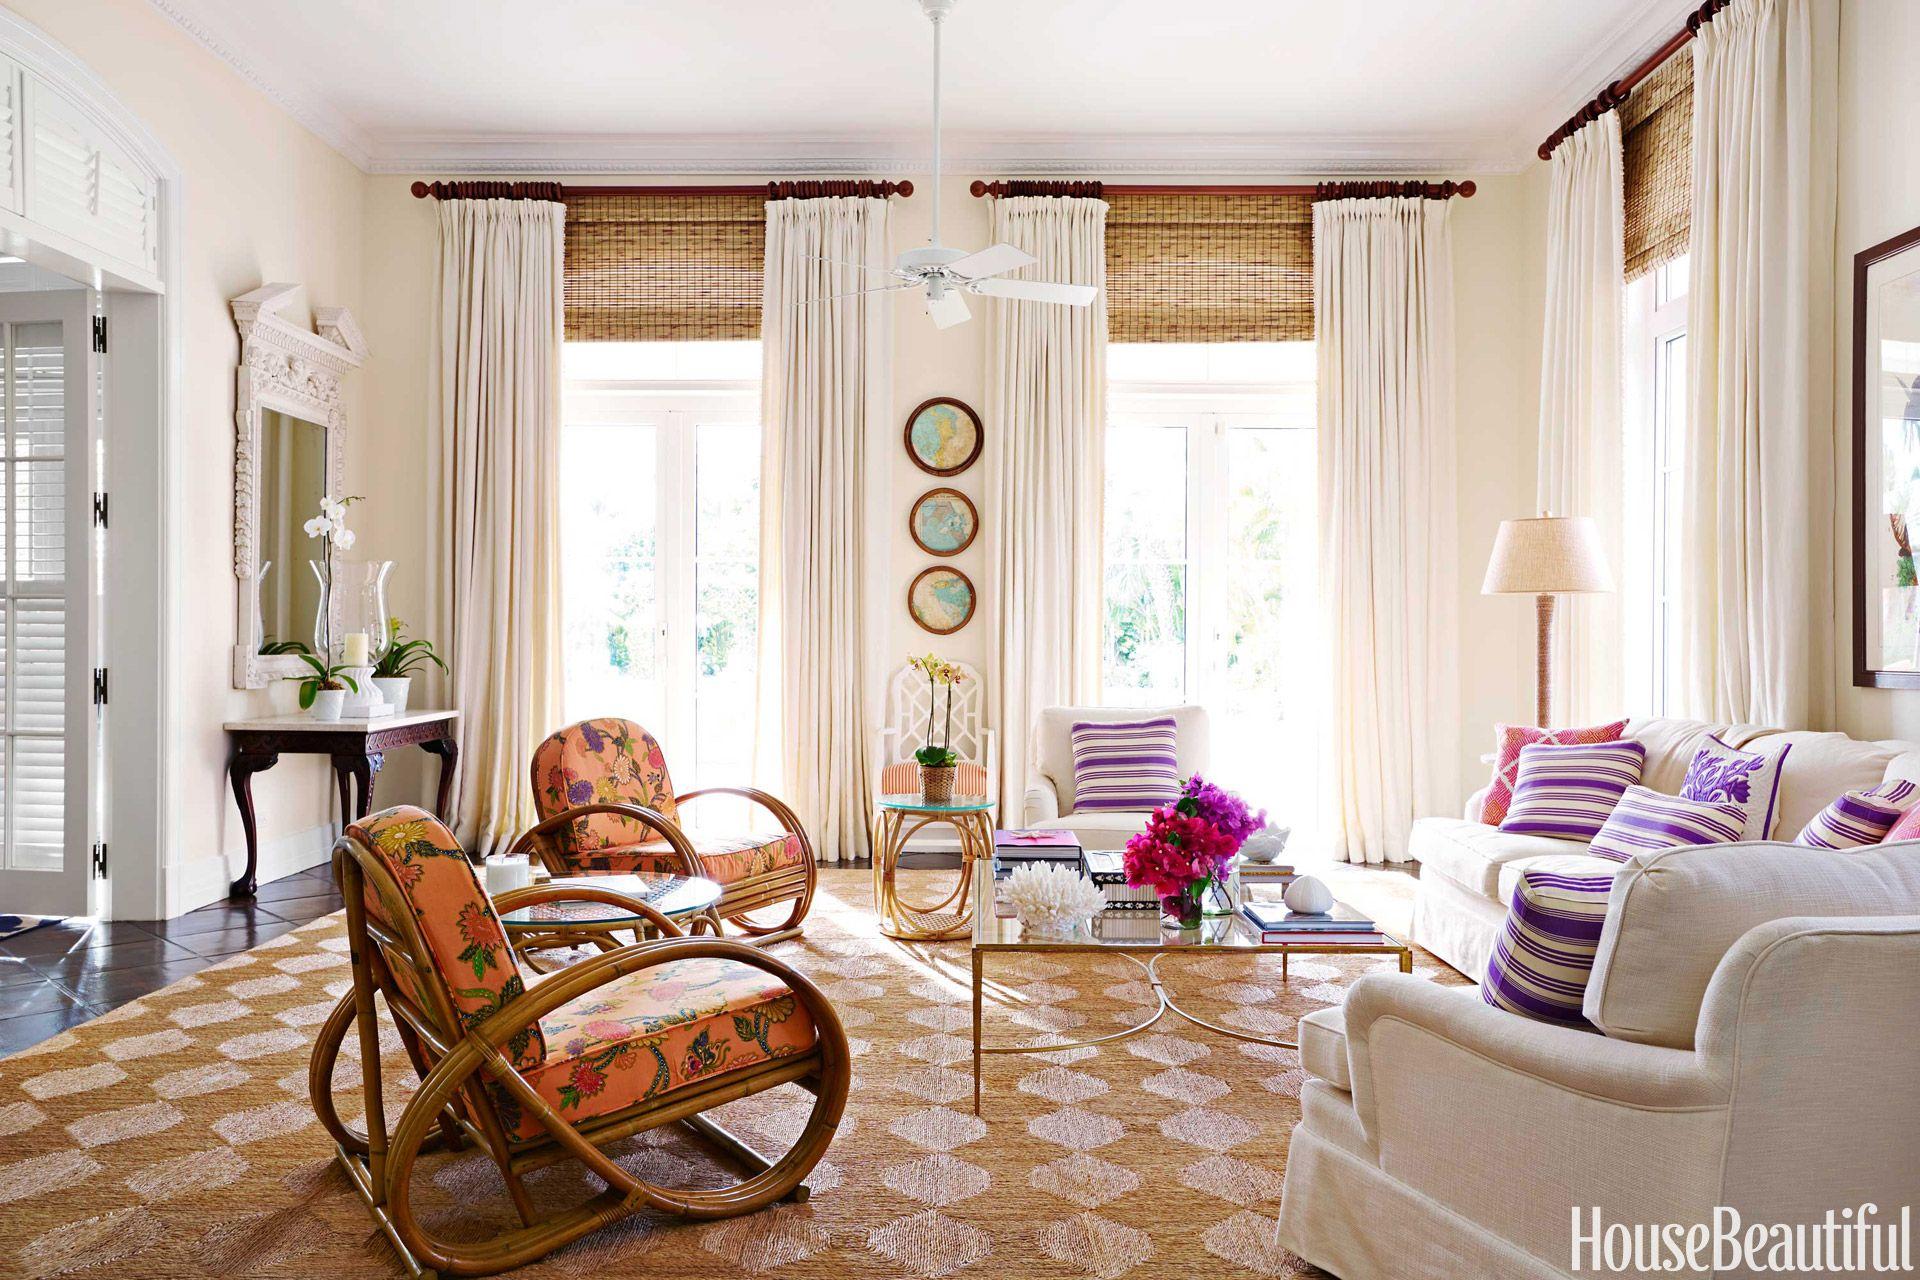 Colorful Bahamas House - Amanda Lindroth Interior Design